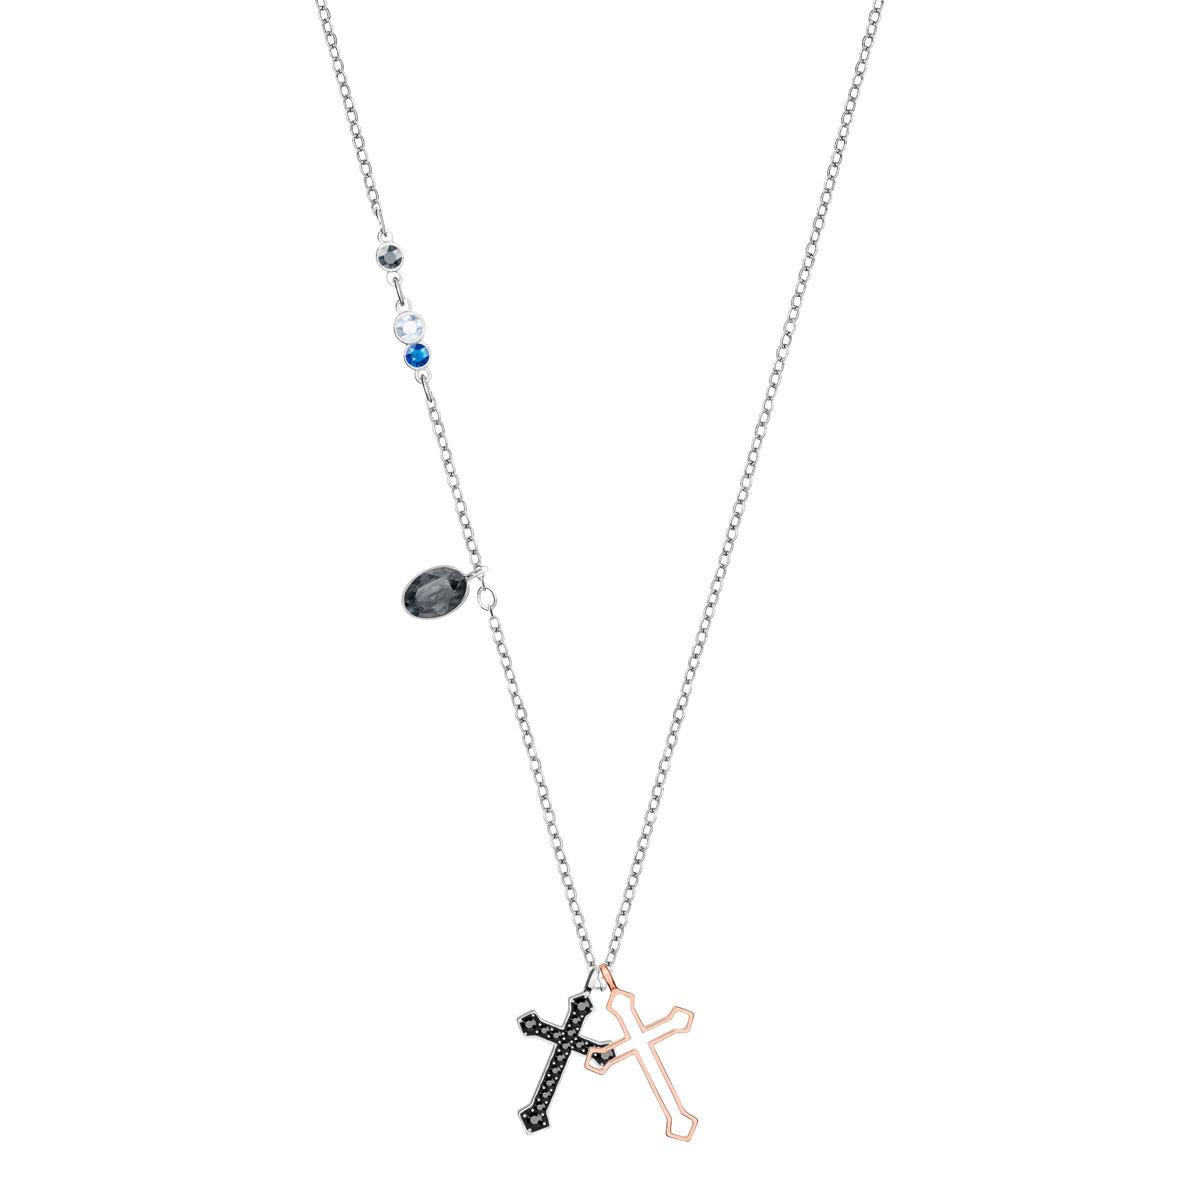 Swarovski Symbolic Mini Cross Pendant, Multi Colored, Mixed metal finish